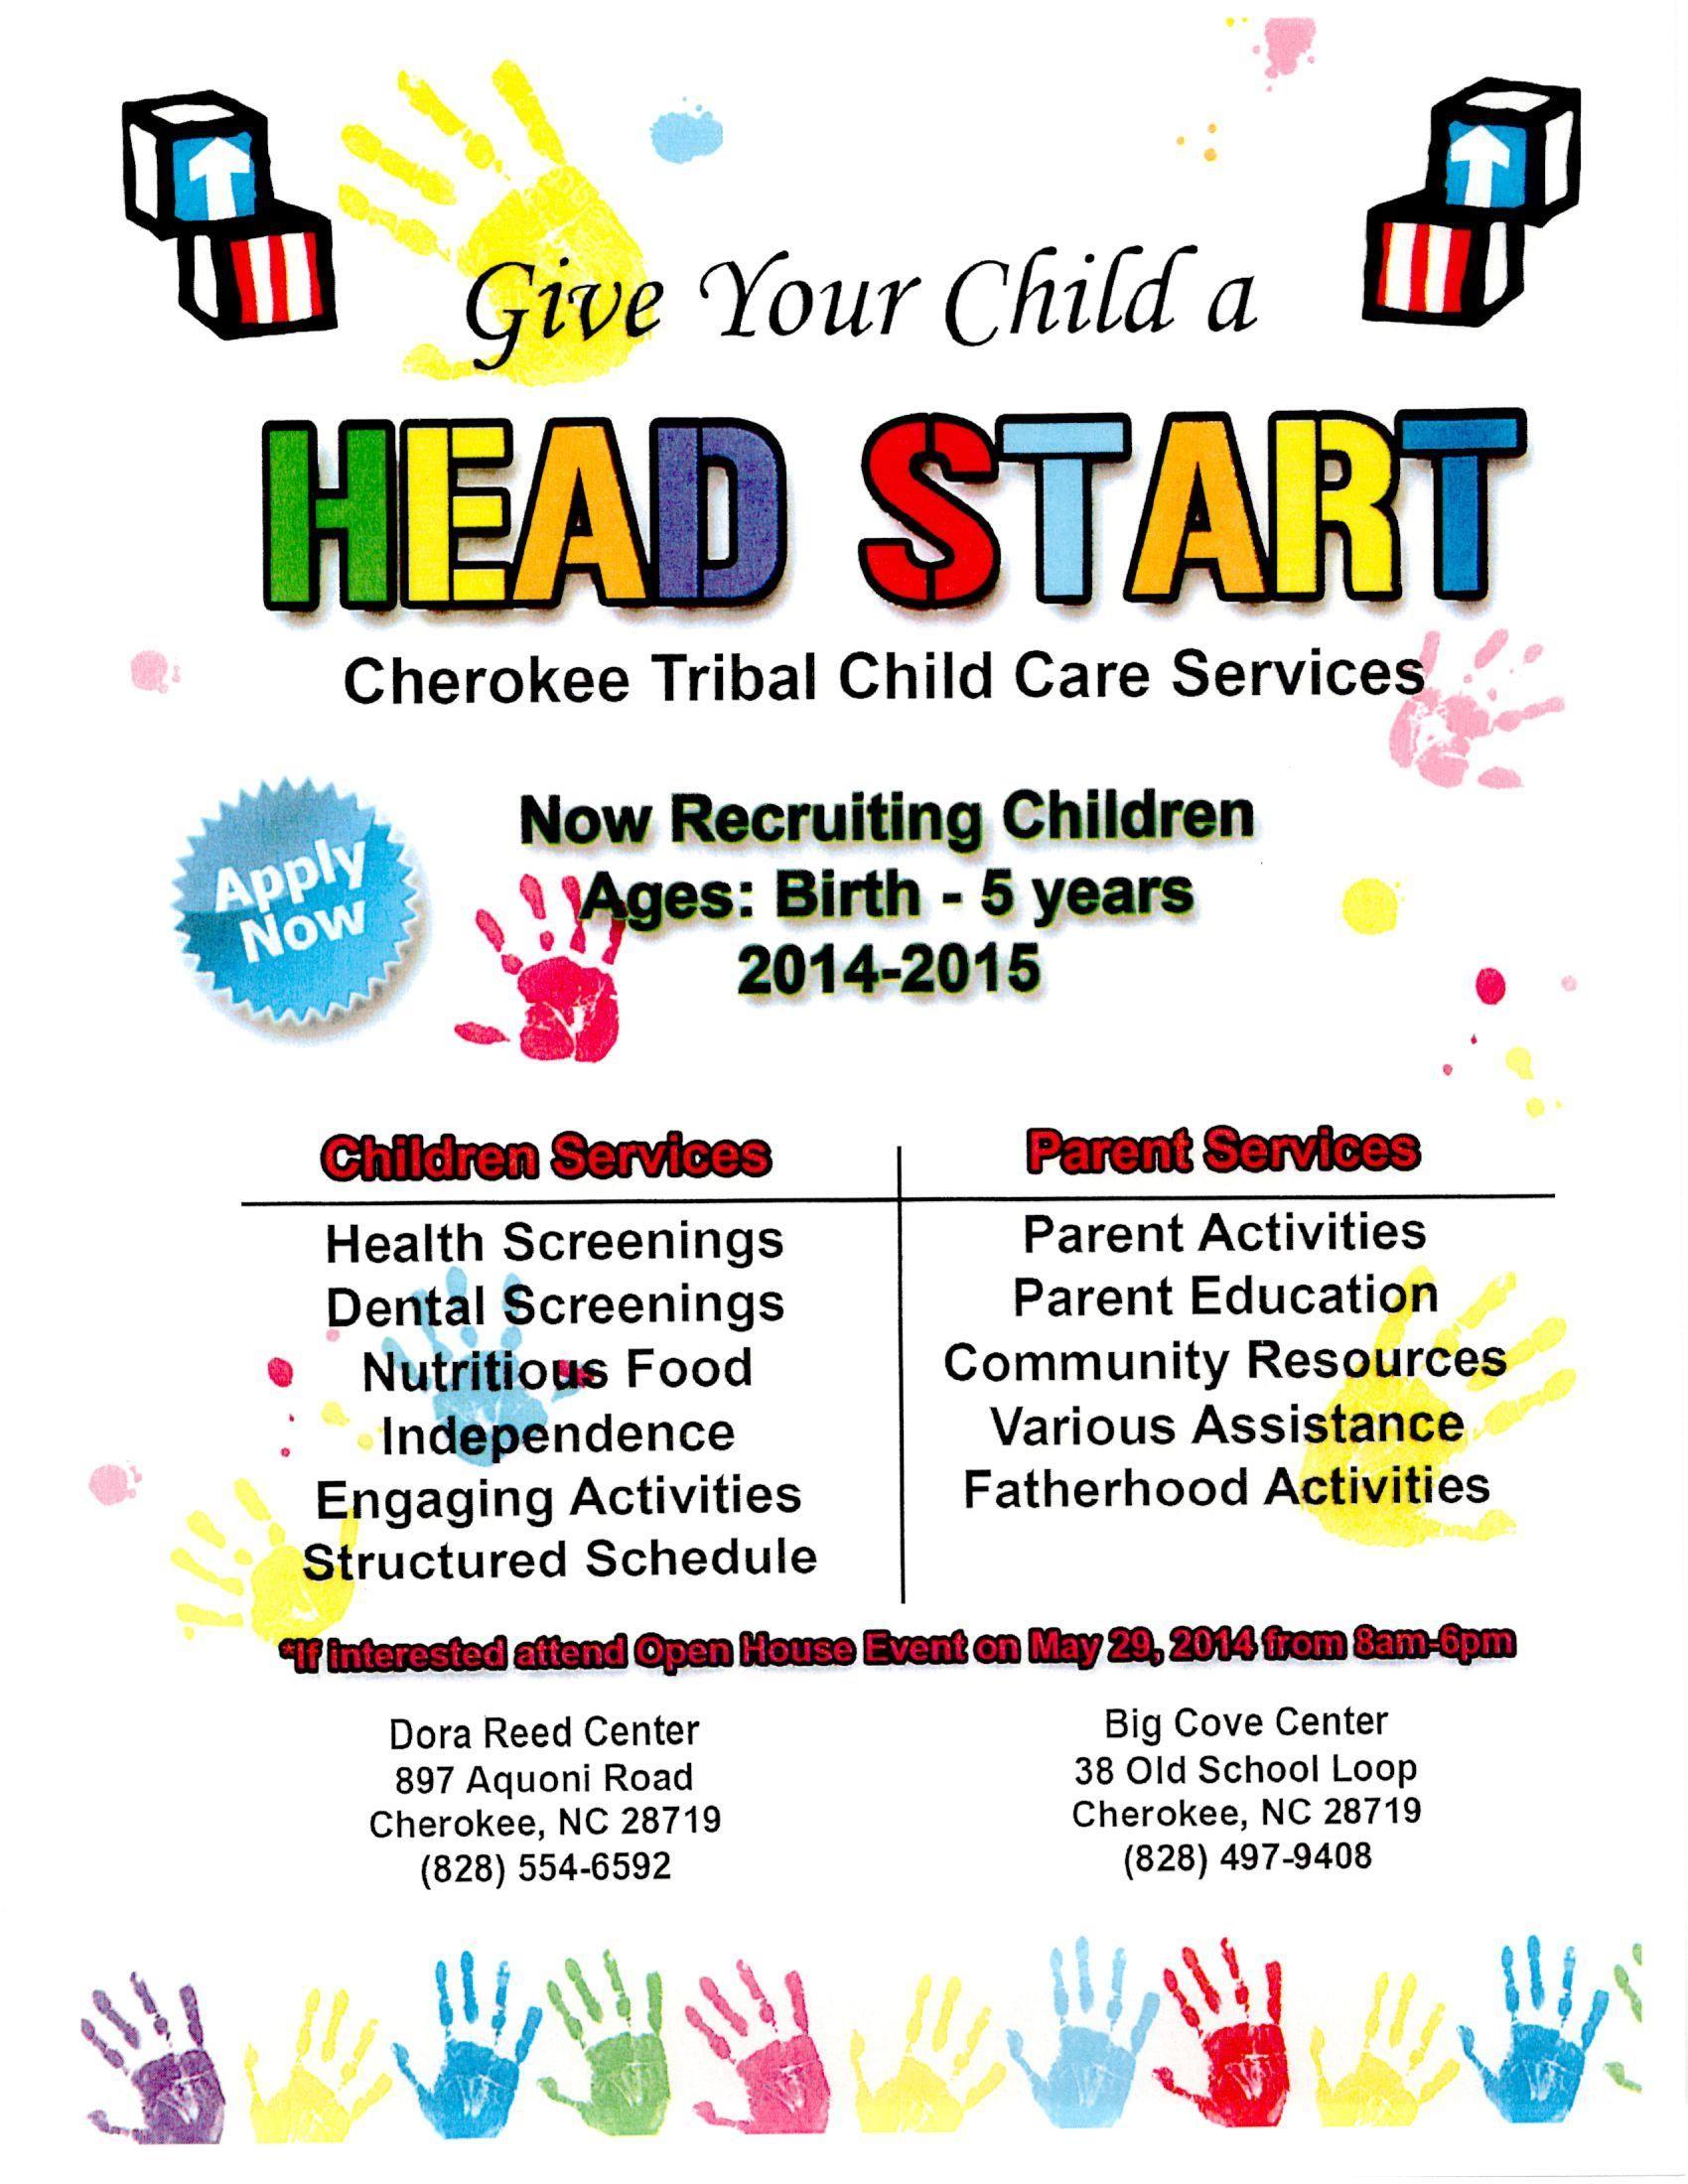 recruitment 2014 Head start, Recruitment, Head start